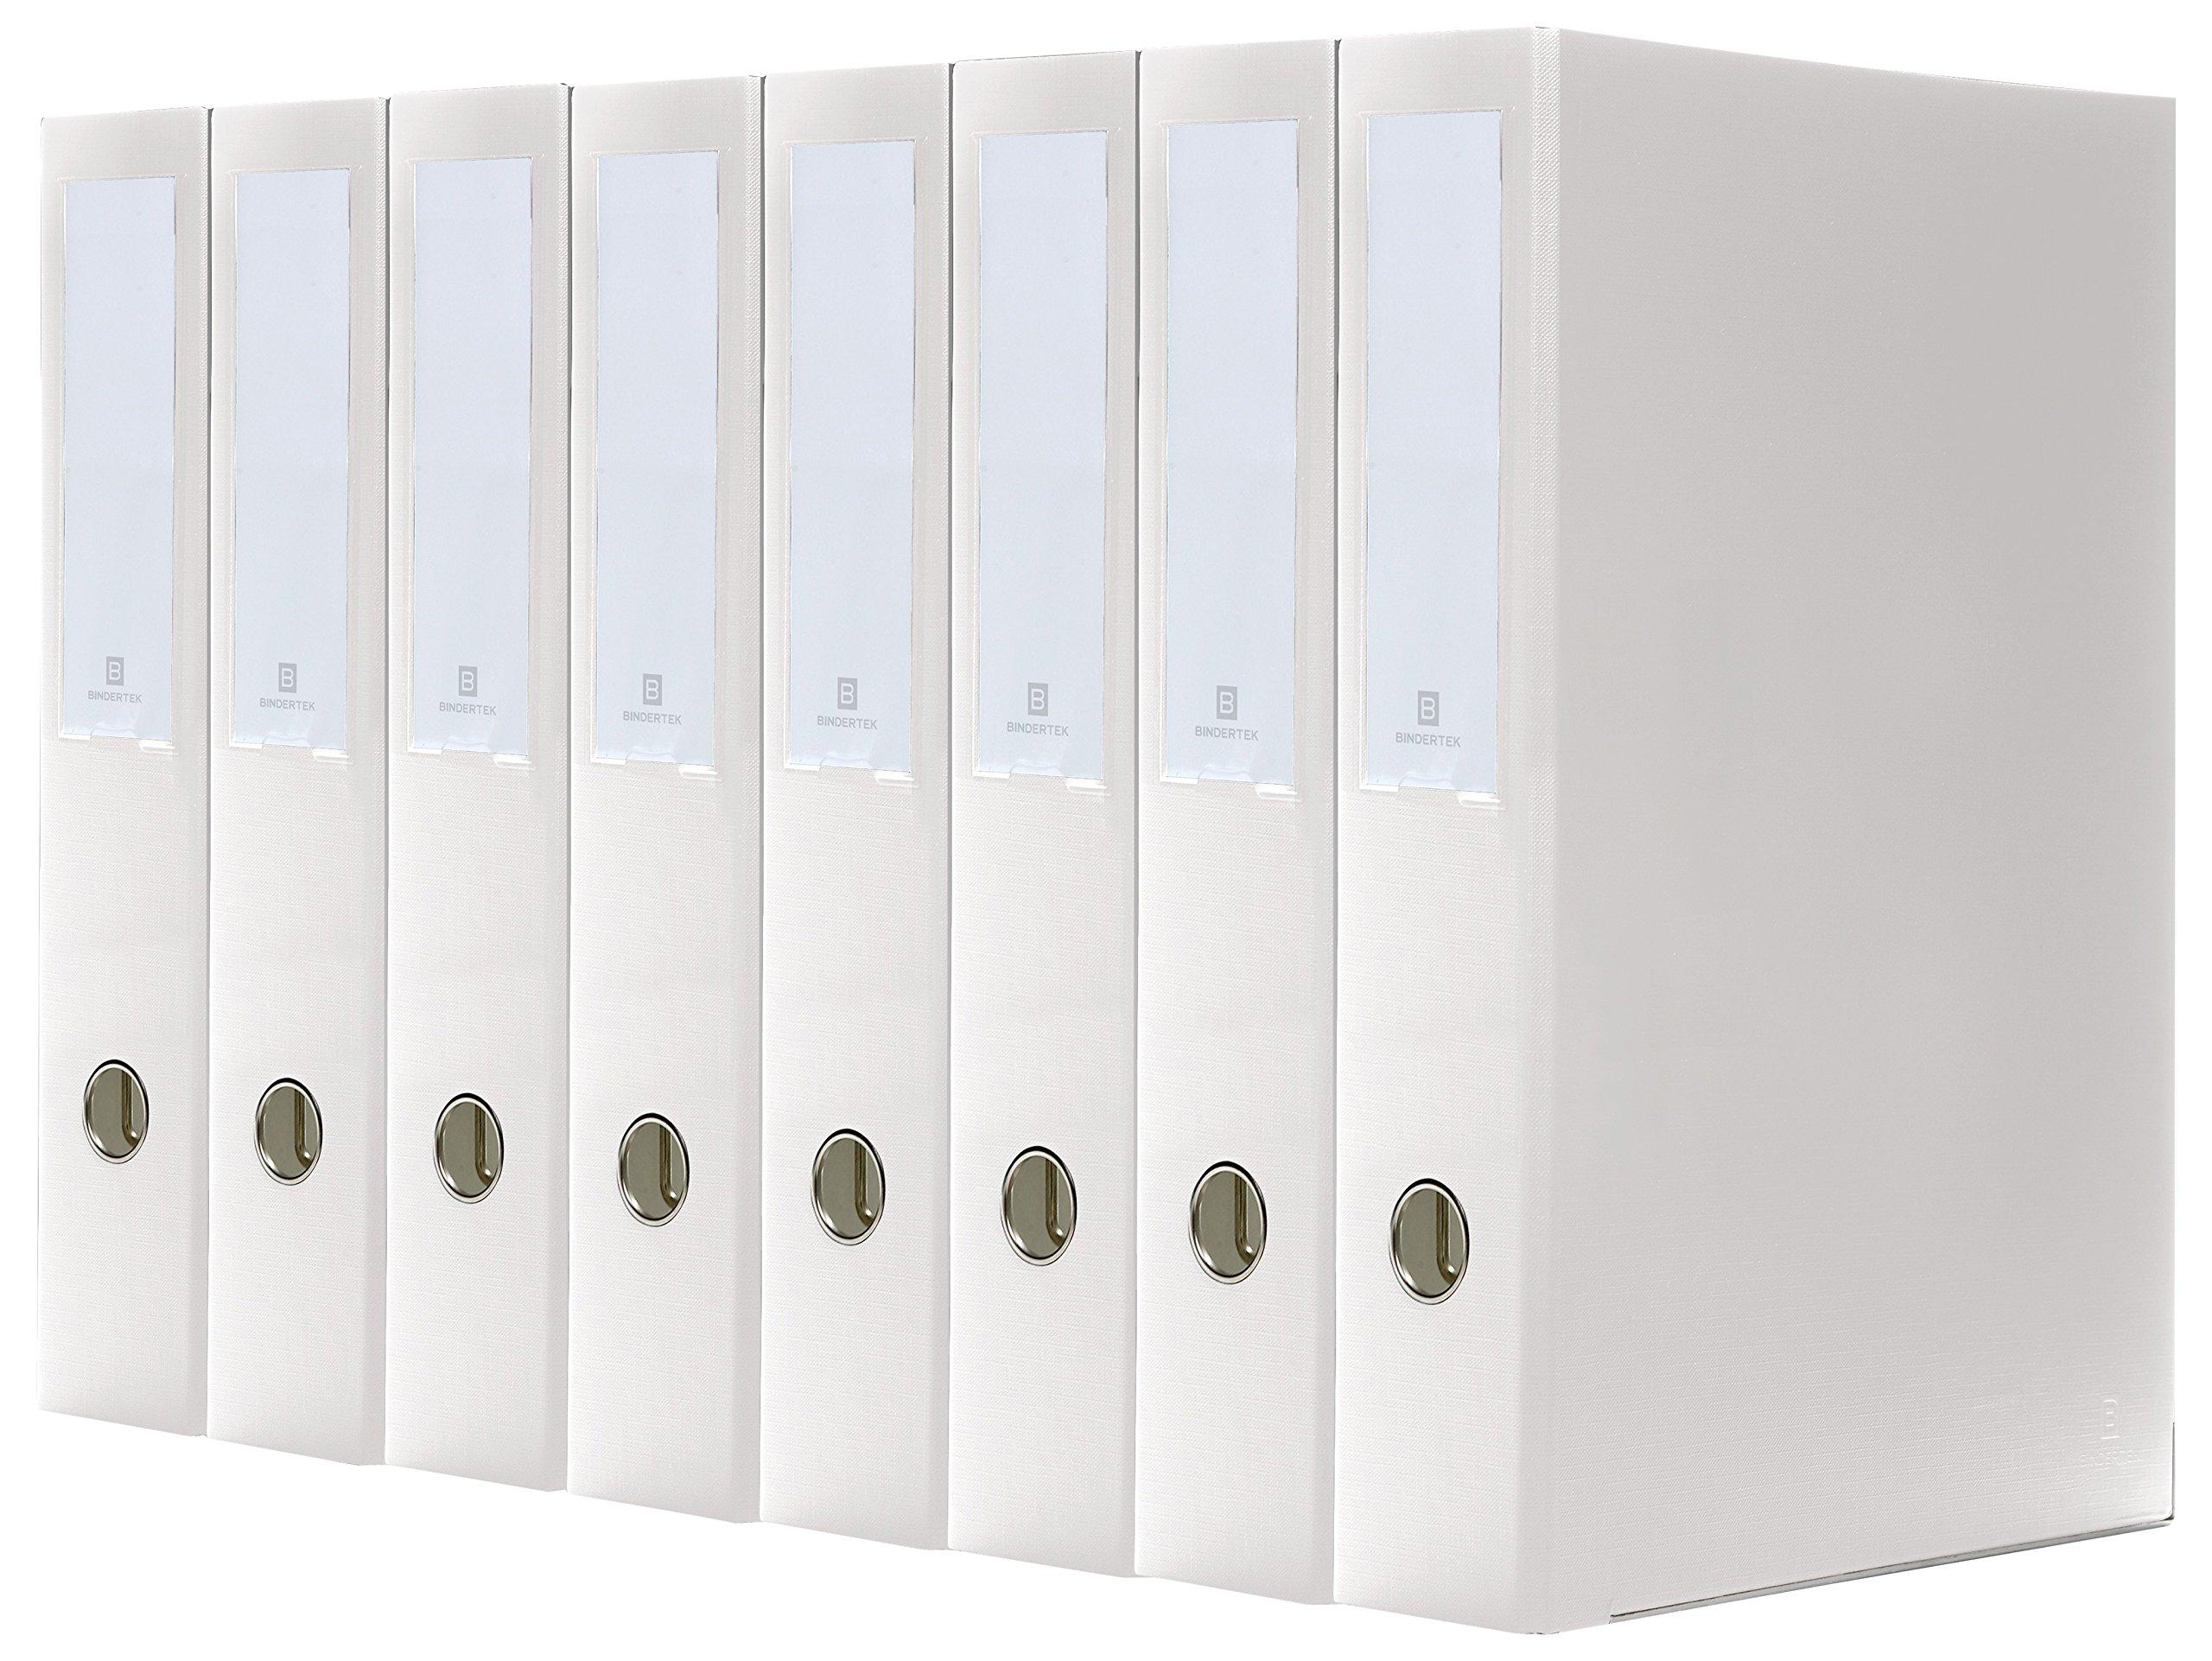 Bindertek 3-Ring 2-Inch Premium Legal Binders 8-Pack, For 8.5 x 14 Paper, White